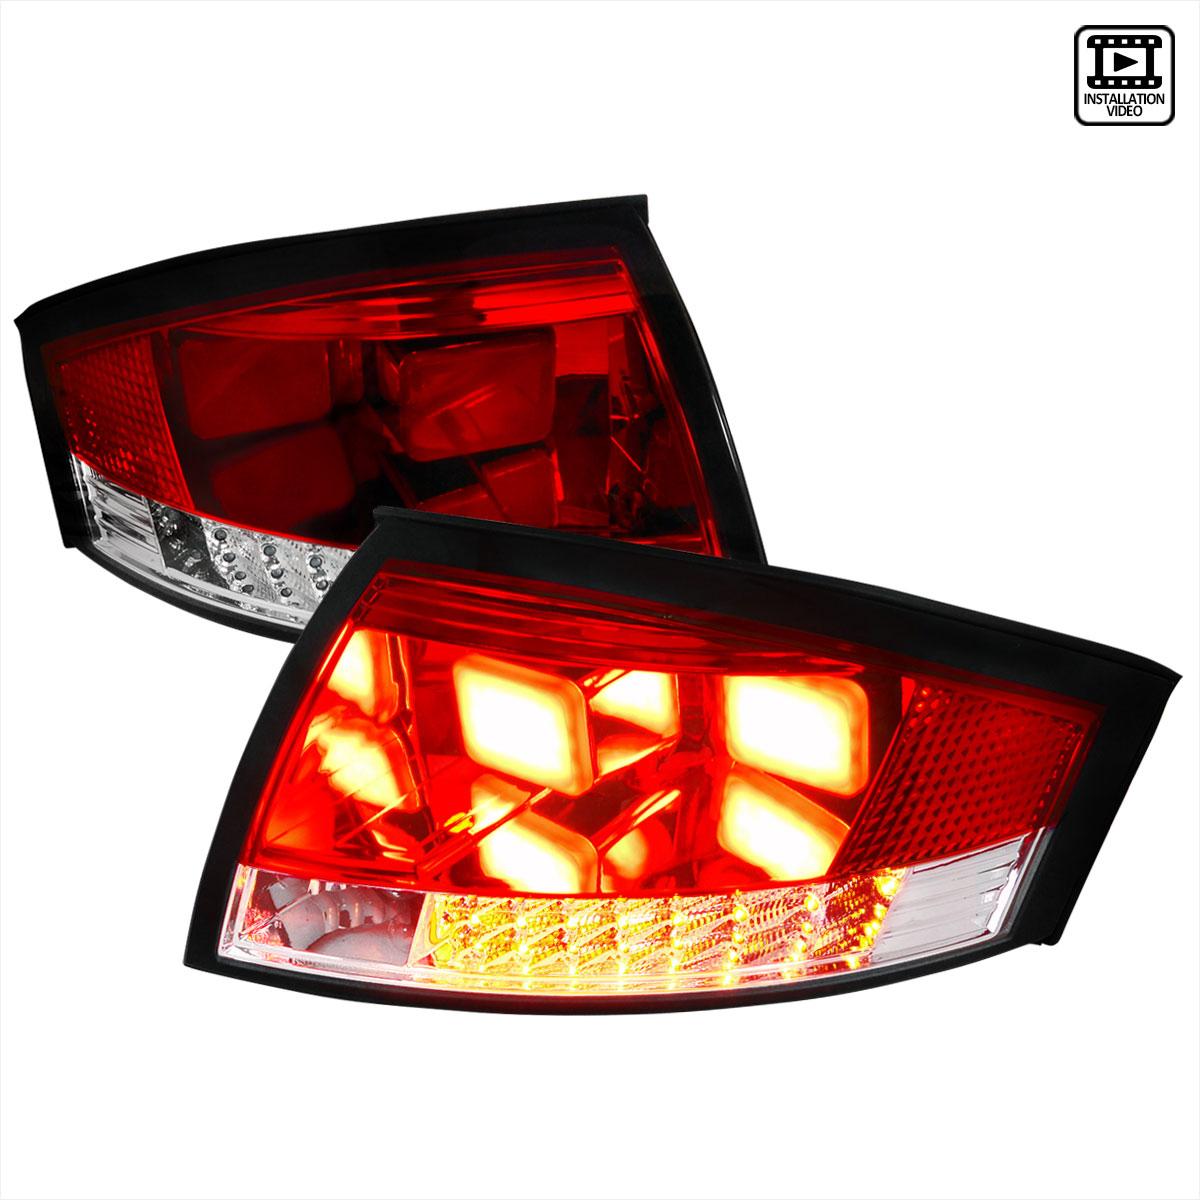 2001 Audi Tt Headlights: Spec-D Tuning LT-TT99RLED-V2-APC